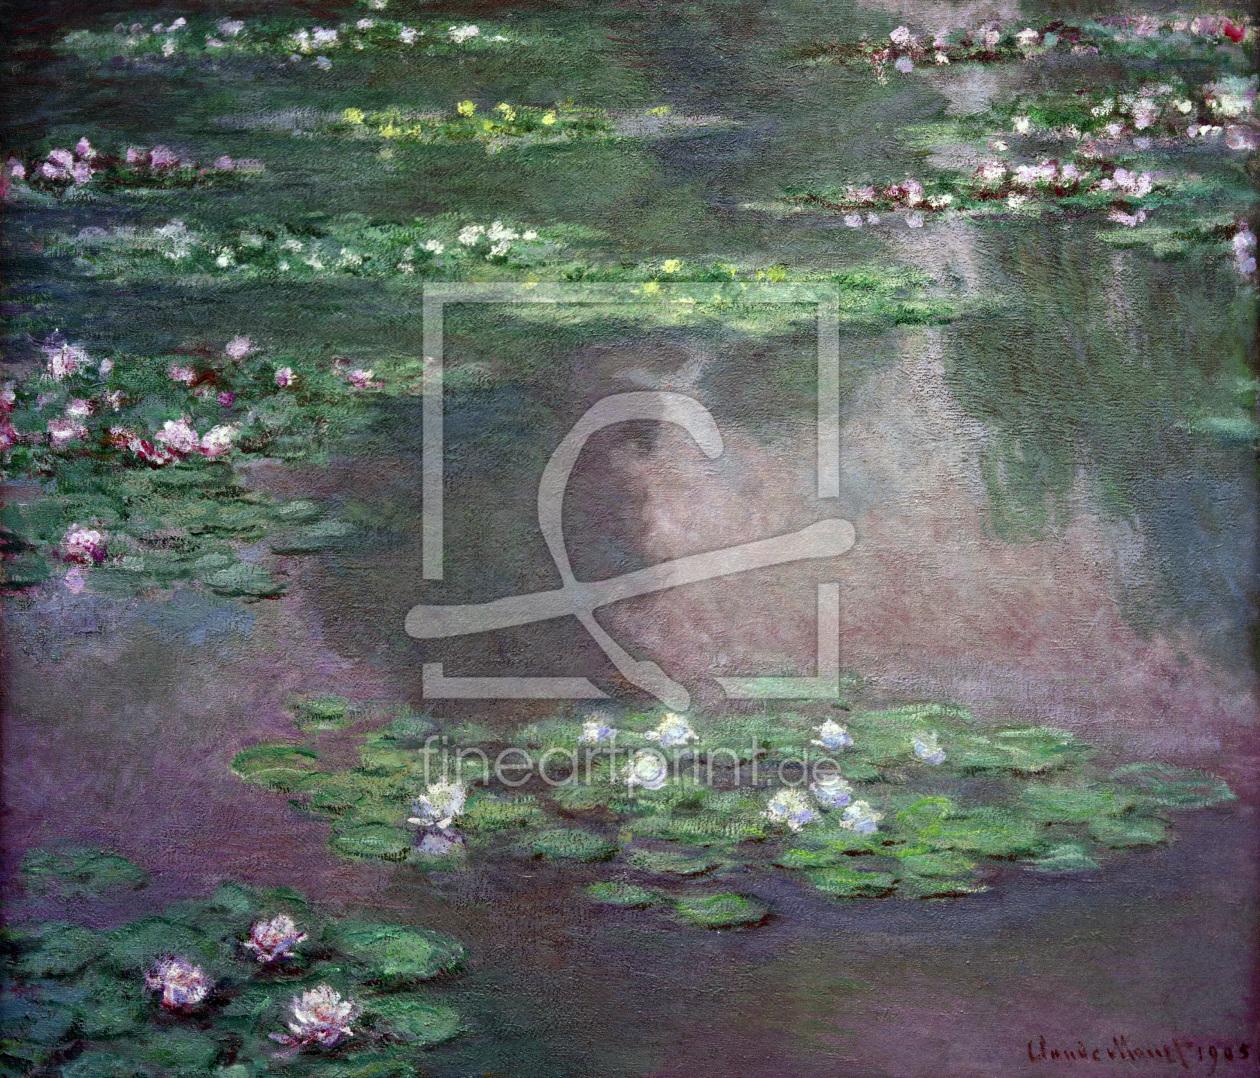 http://www.fineartprint.de/dynimage/bigpreview/0030000000/30004000/30004052.jpg